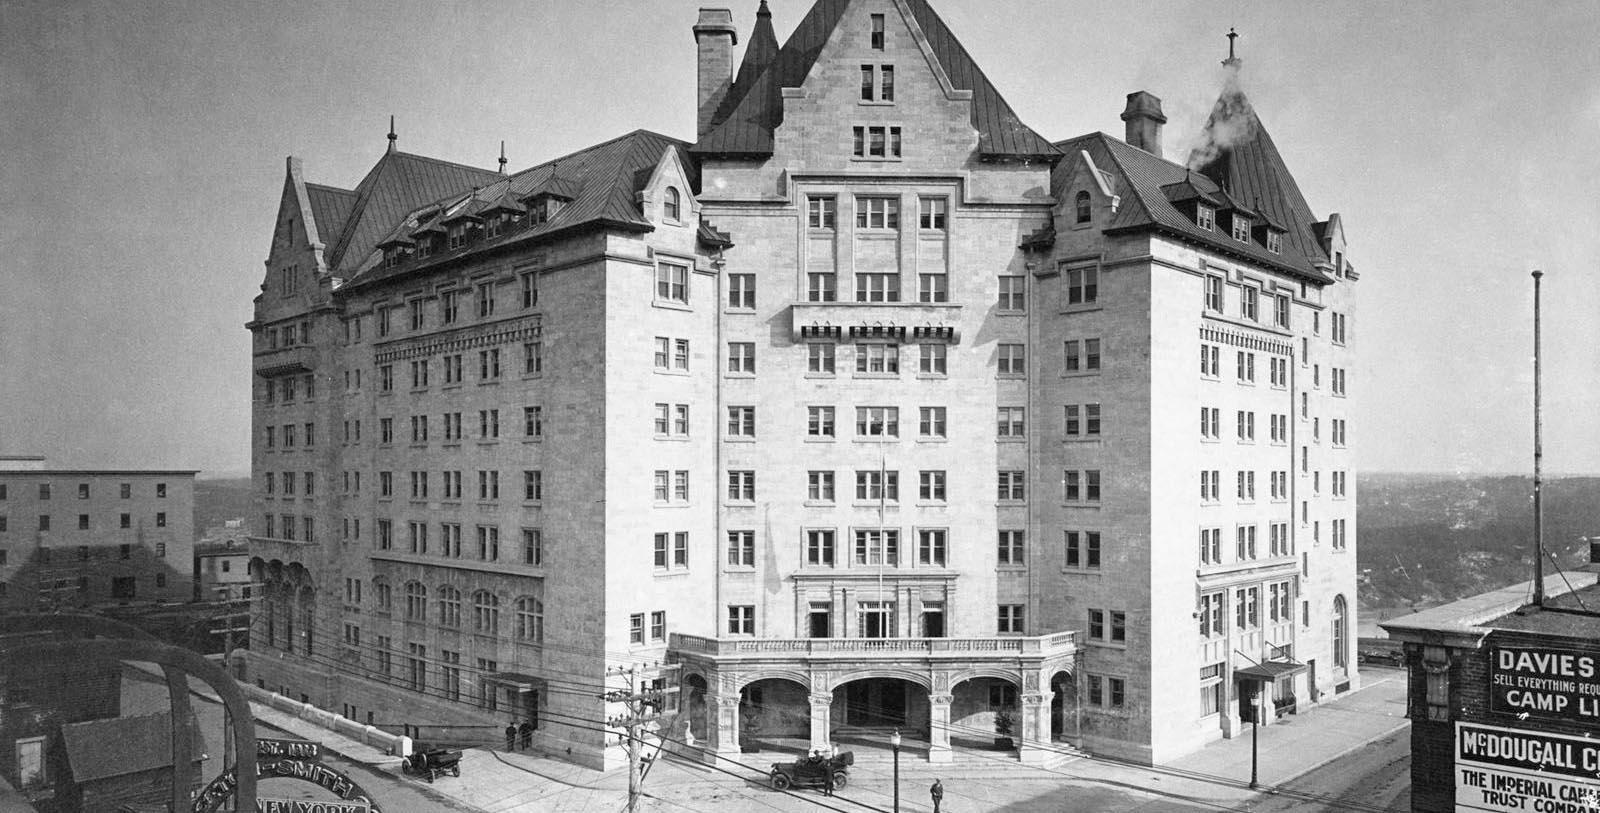 Historic Exterior of Hotel Macdonald in Edmonton, Alberta, Canada